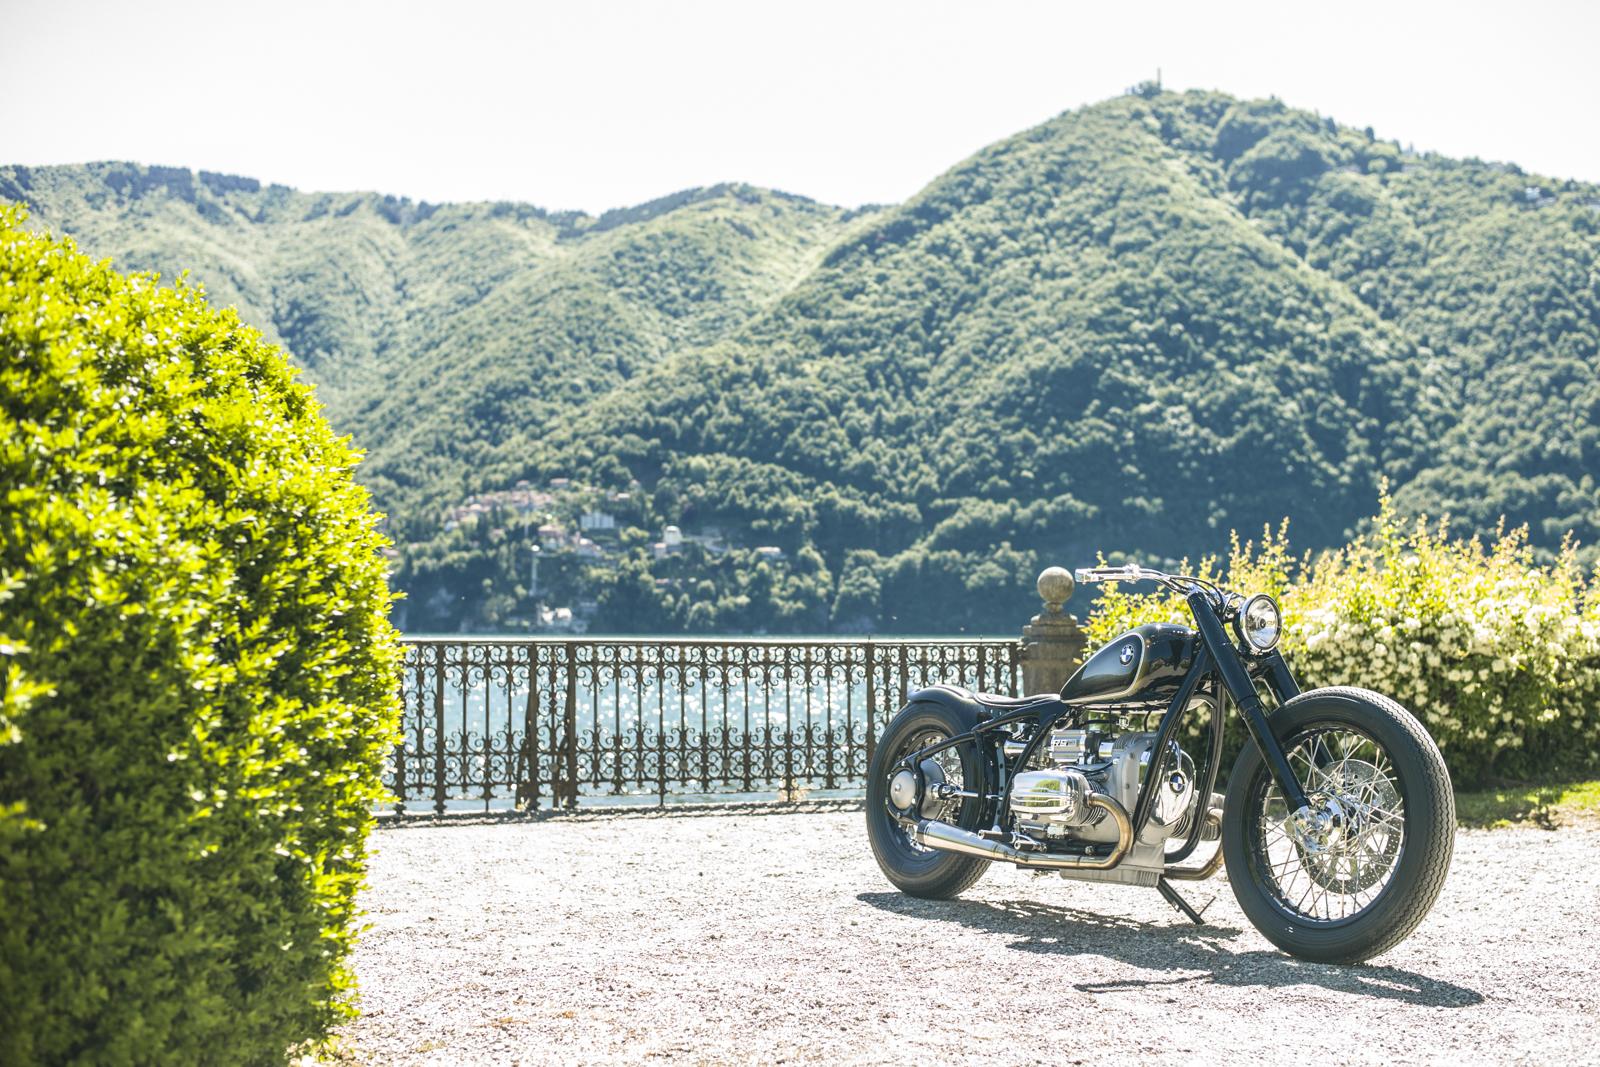 bmw-r5-hommage-bike-villa-deste-5-autonovosti.me-2